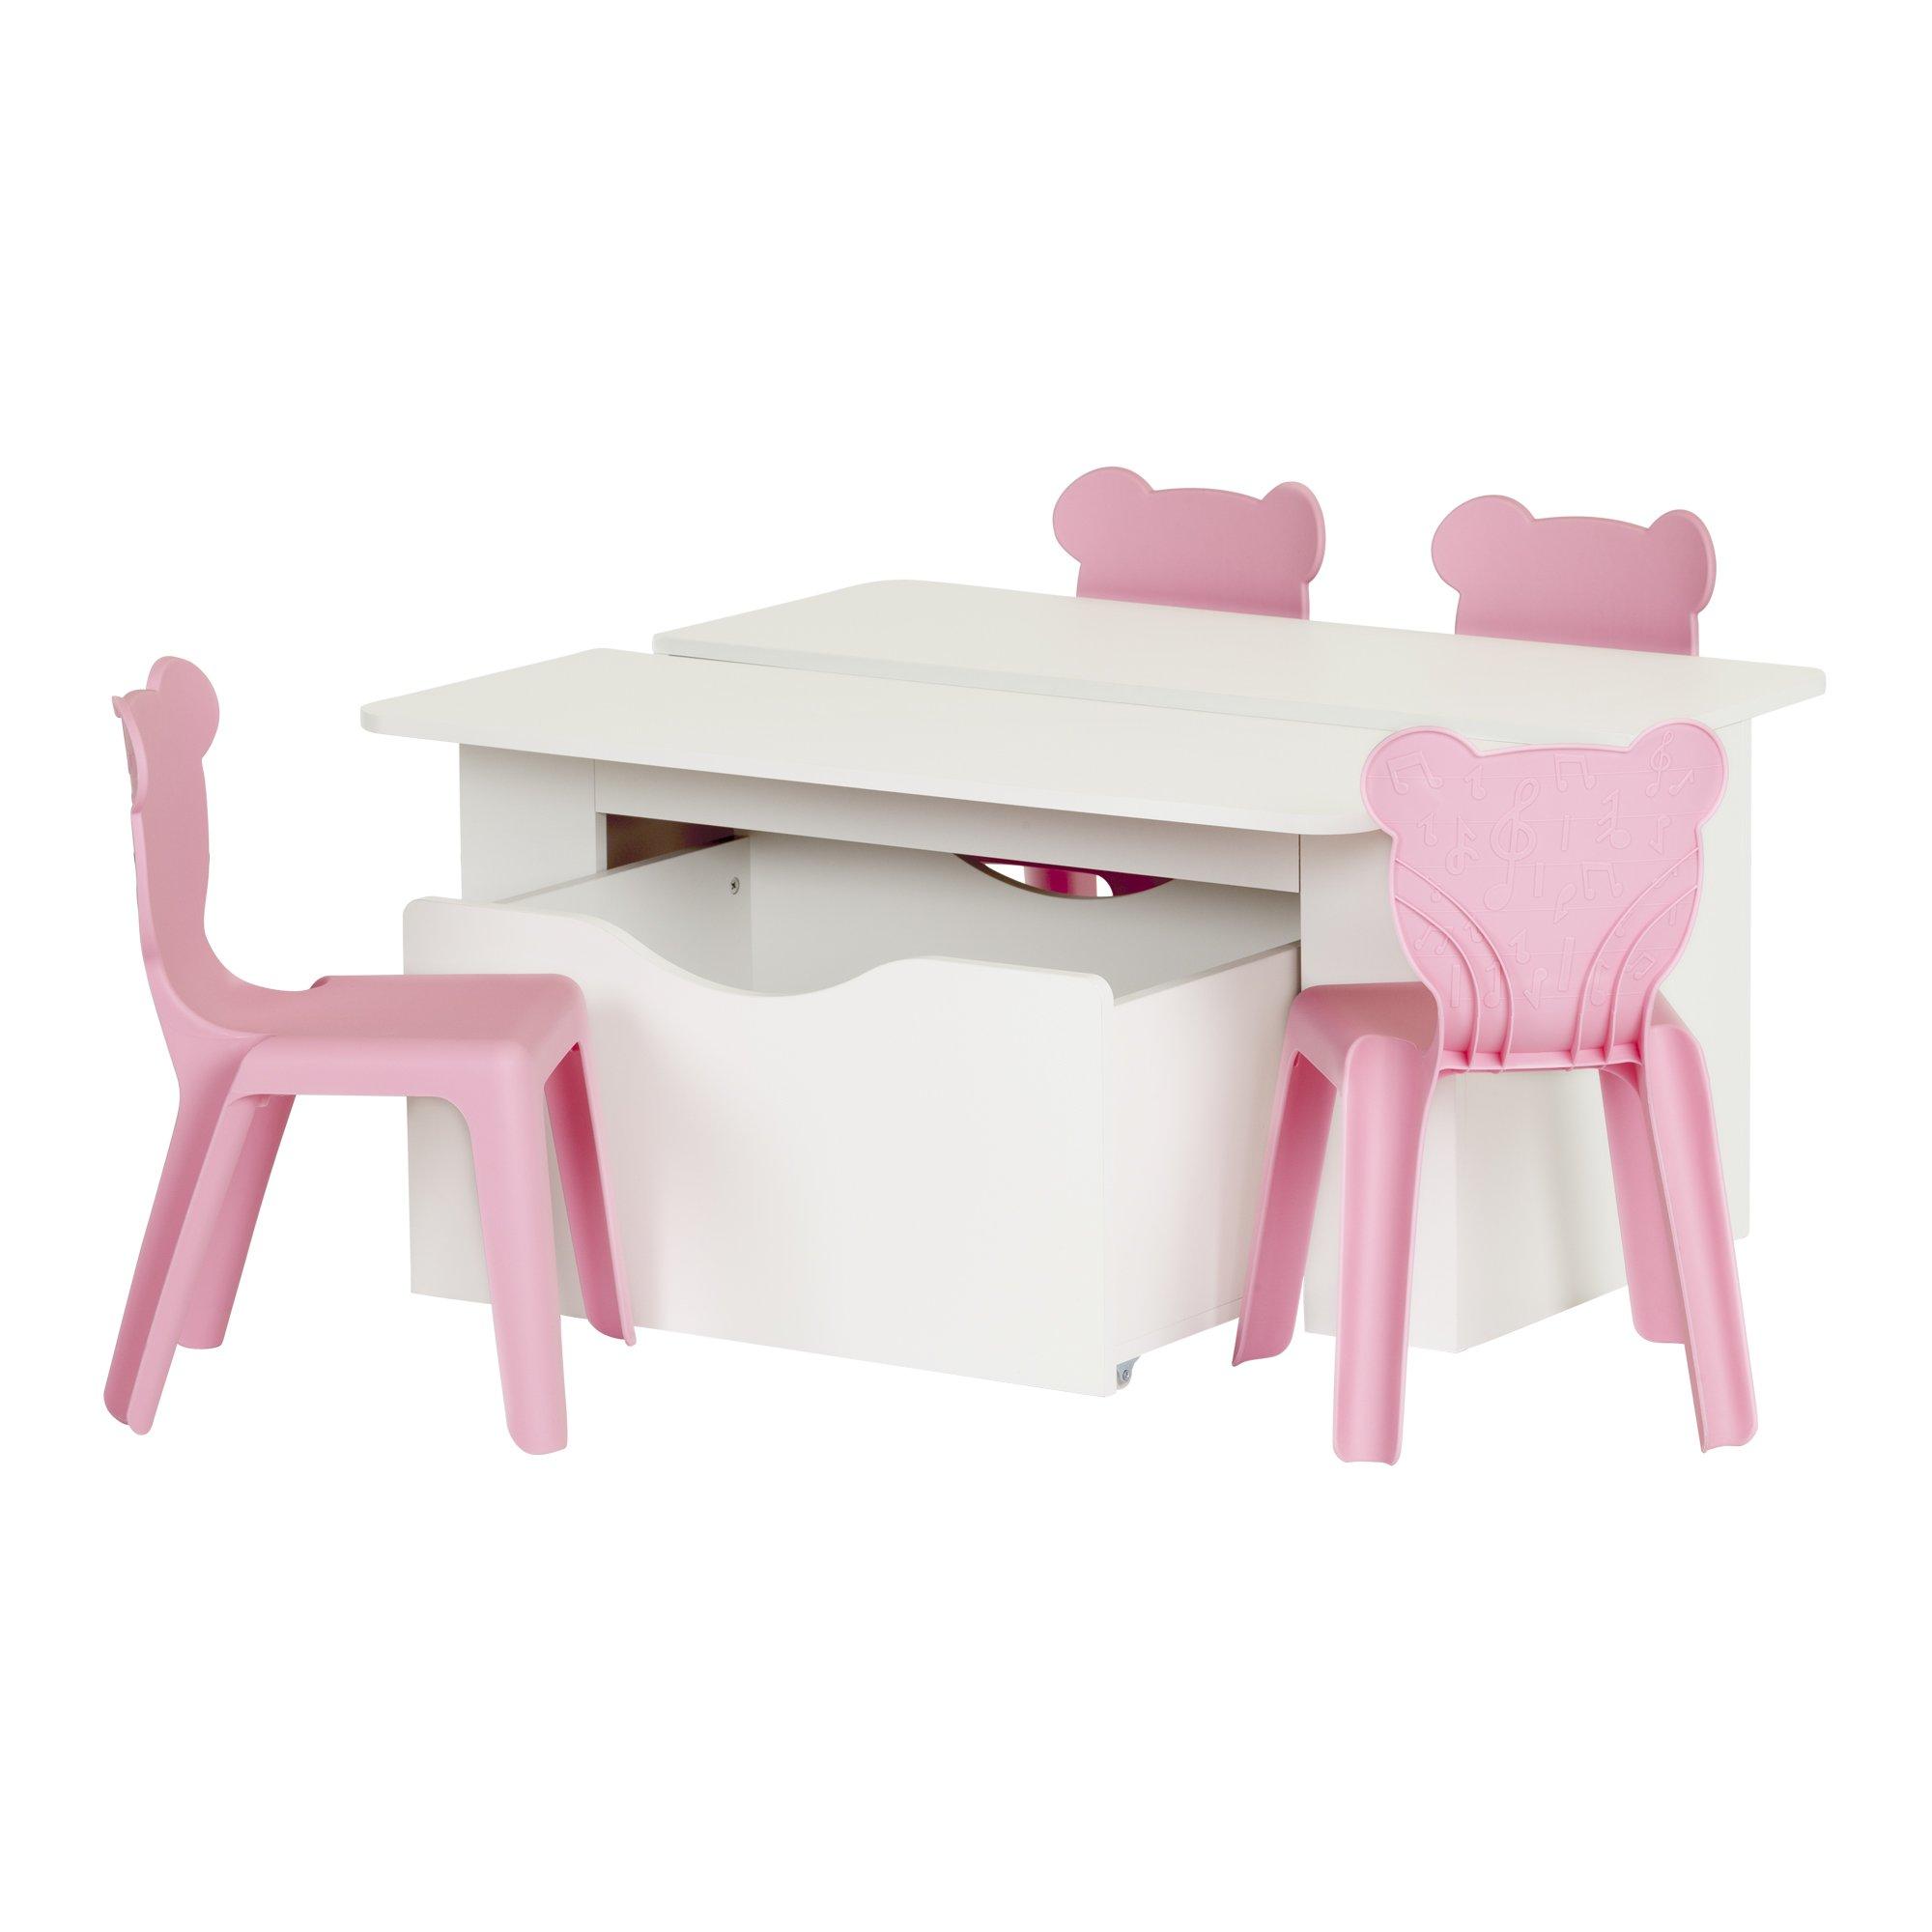 South Shore Crea Pure White Kids Activity Table & 4 Plastic Chairs Set, Pink